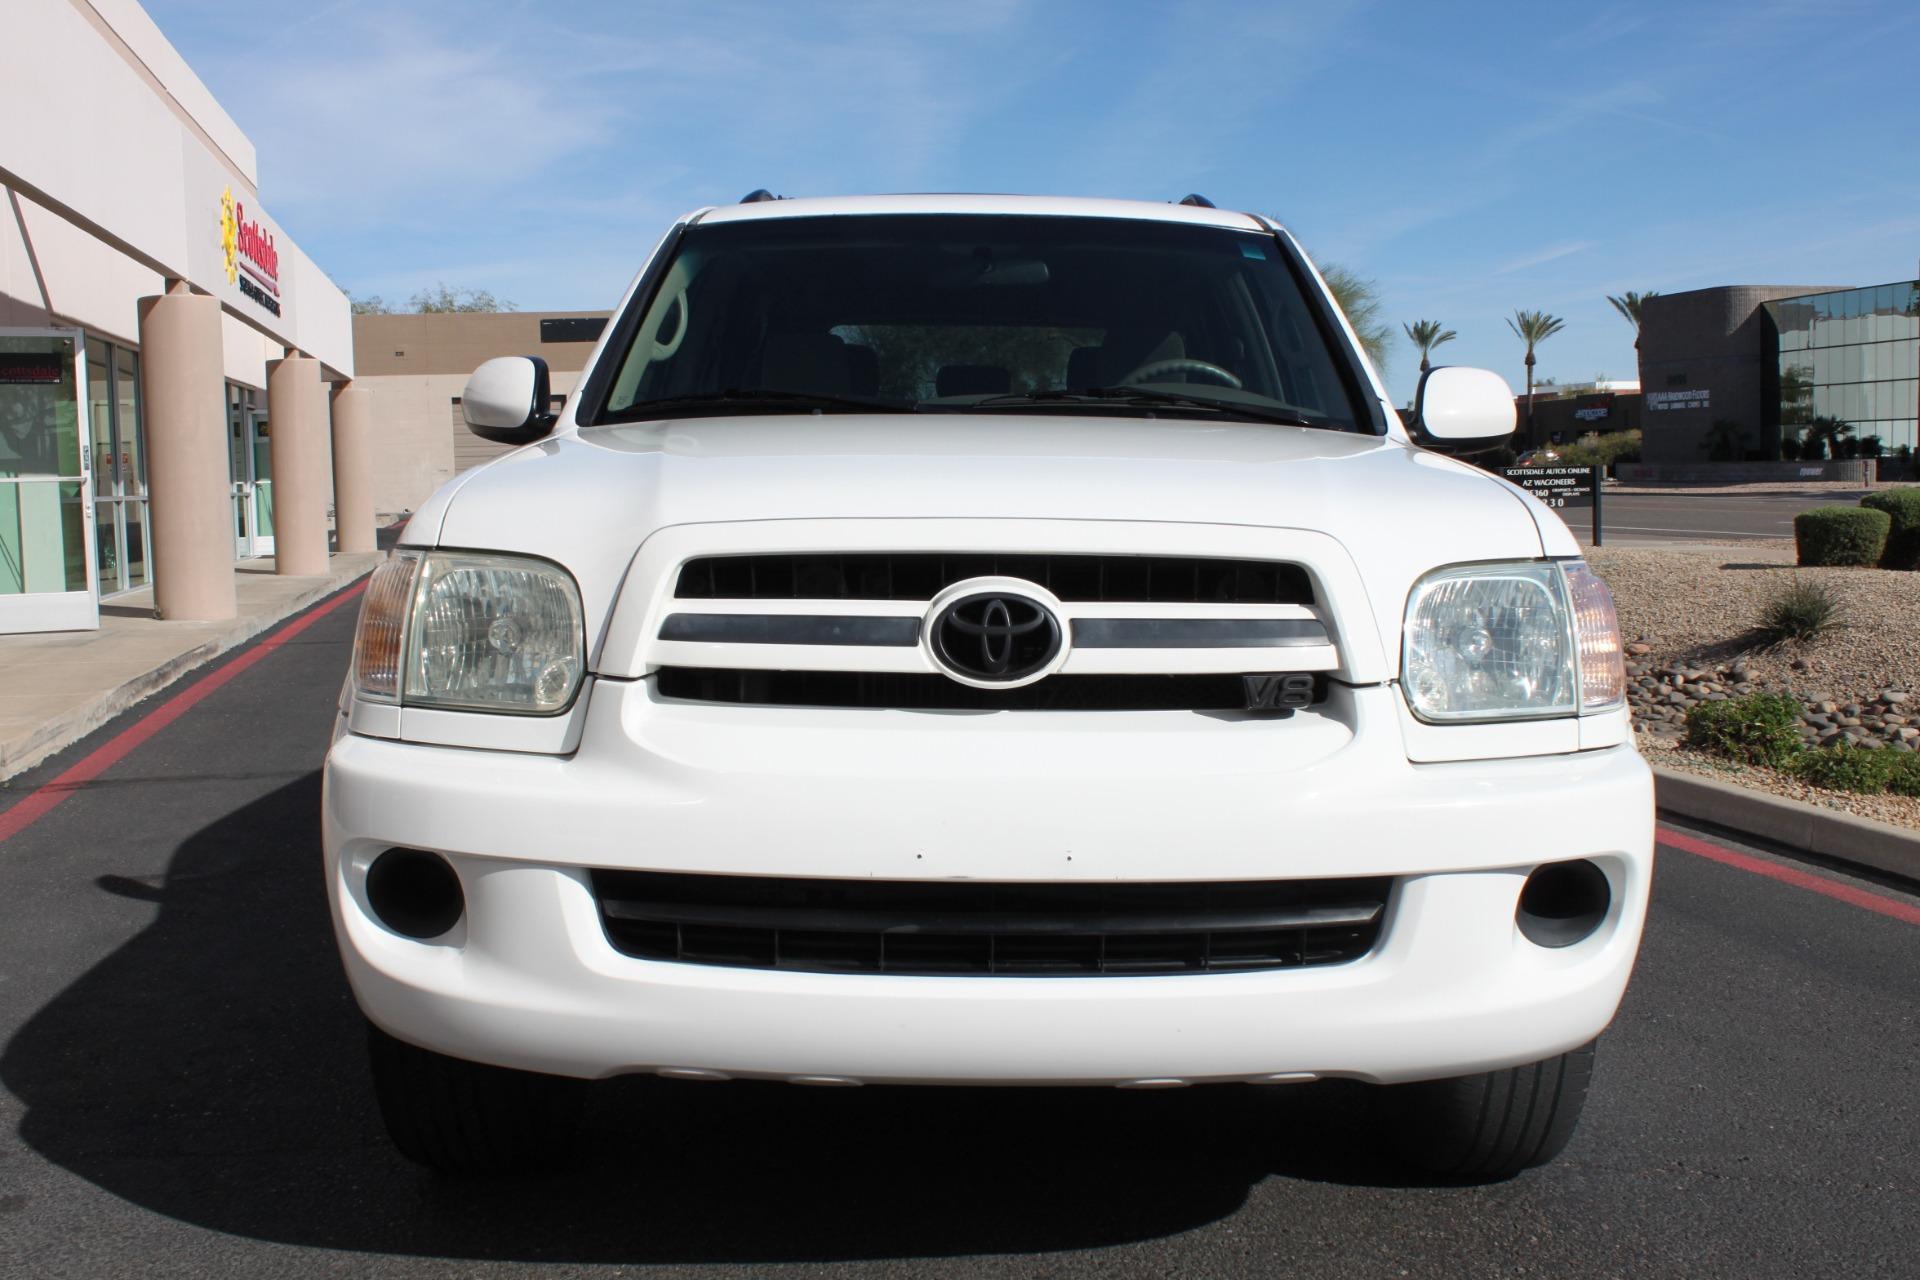 Used-2005-Toyota-Sequoia-SR5-Wrangler